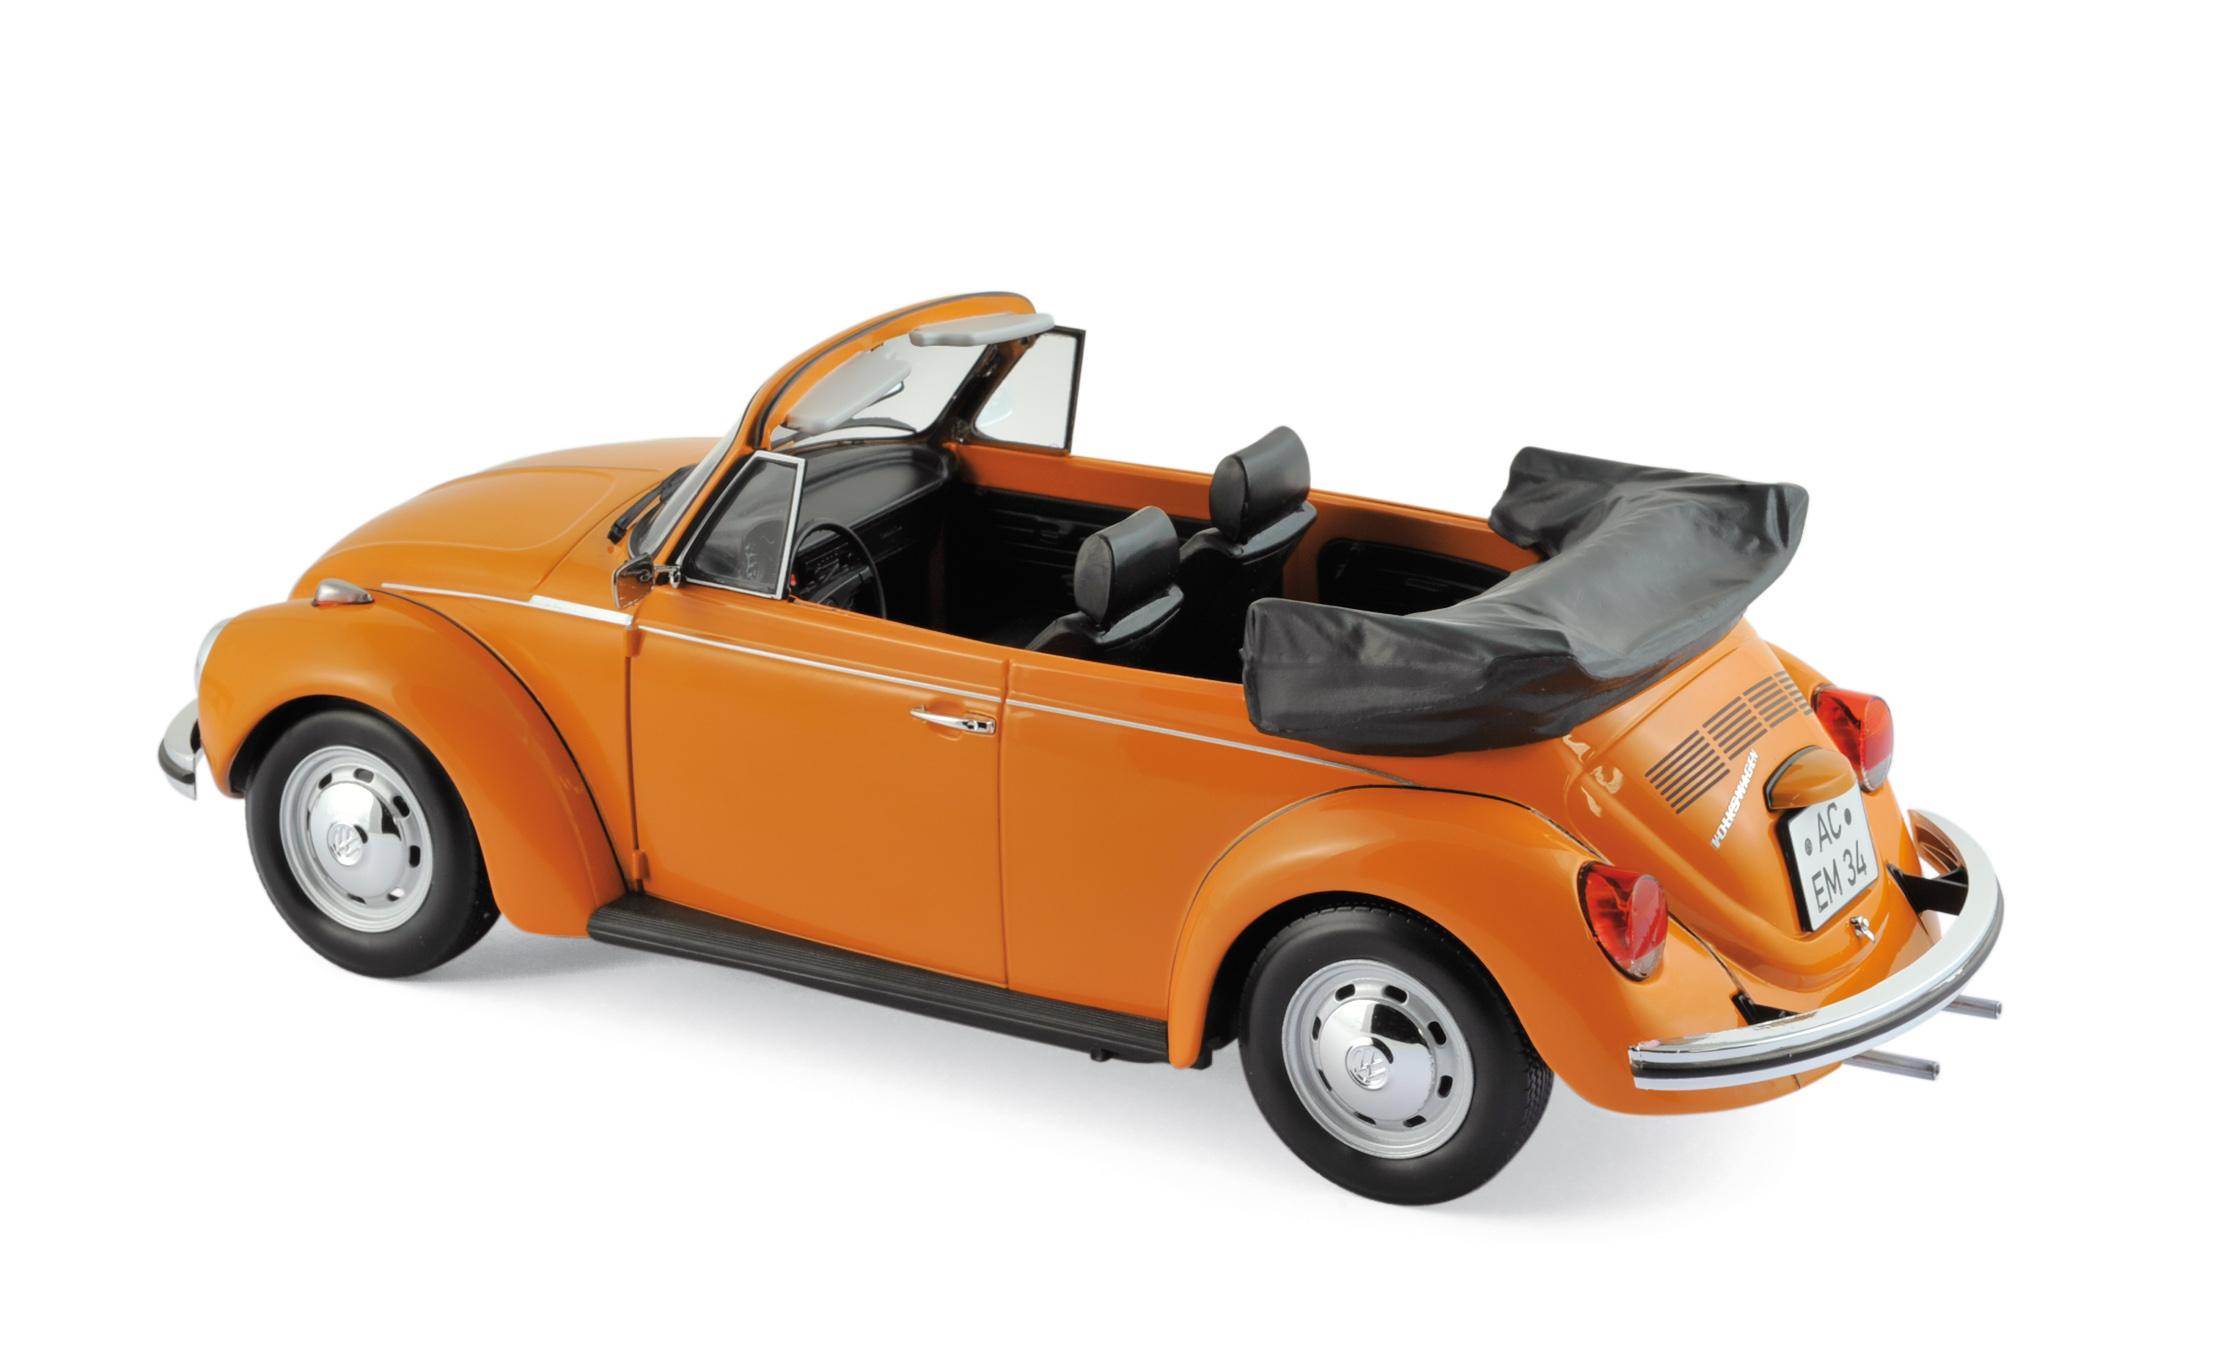 modellauto volkswagen vw k fer 1303 cabriolet 1972 orange norev 1 18 t ren motorhaube. Black Bedroom Furniture Sets. Home Design Ideas